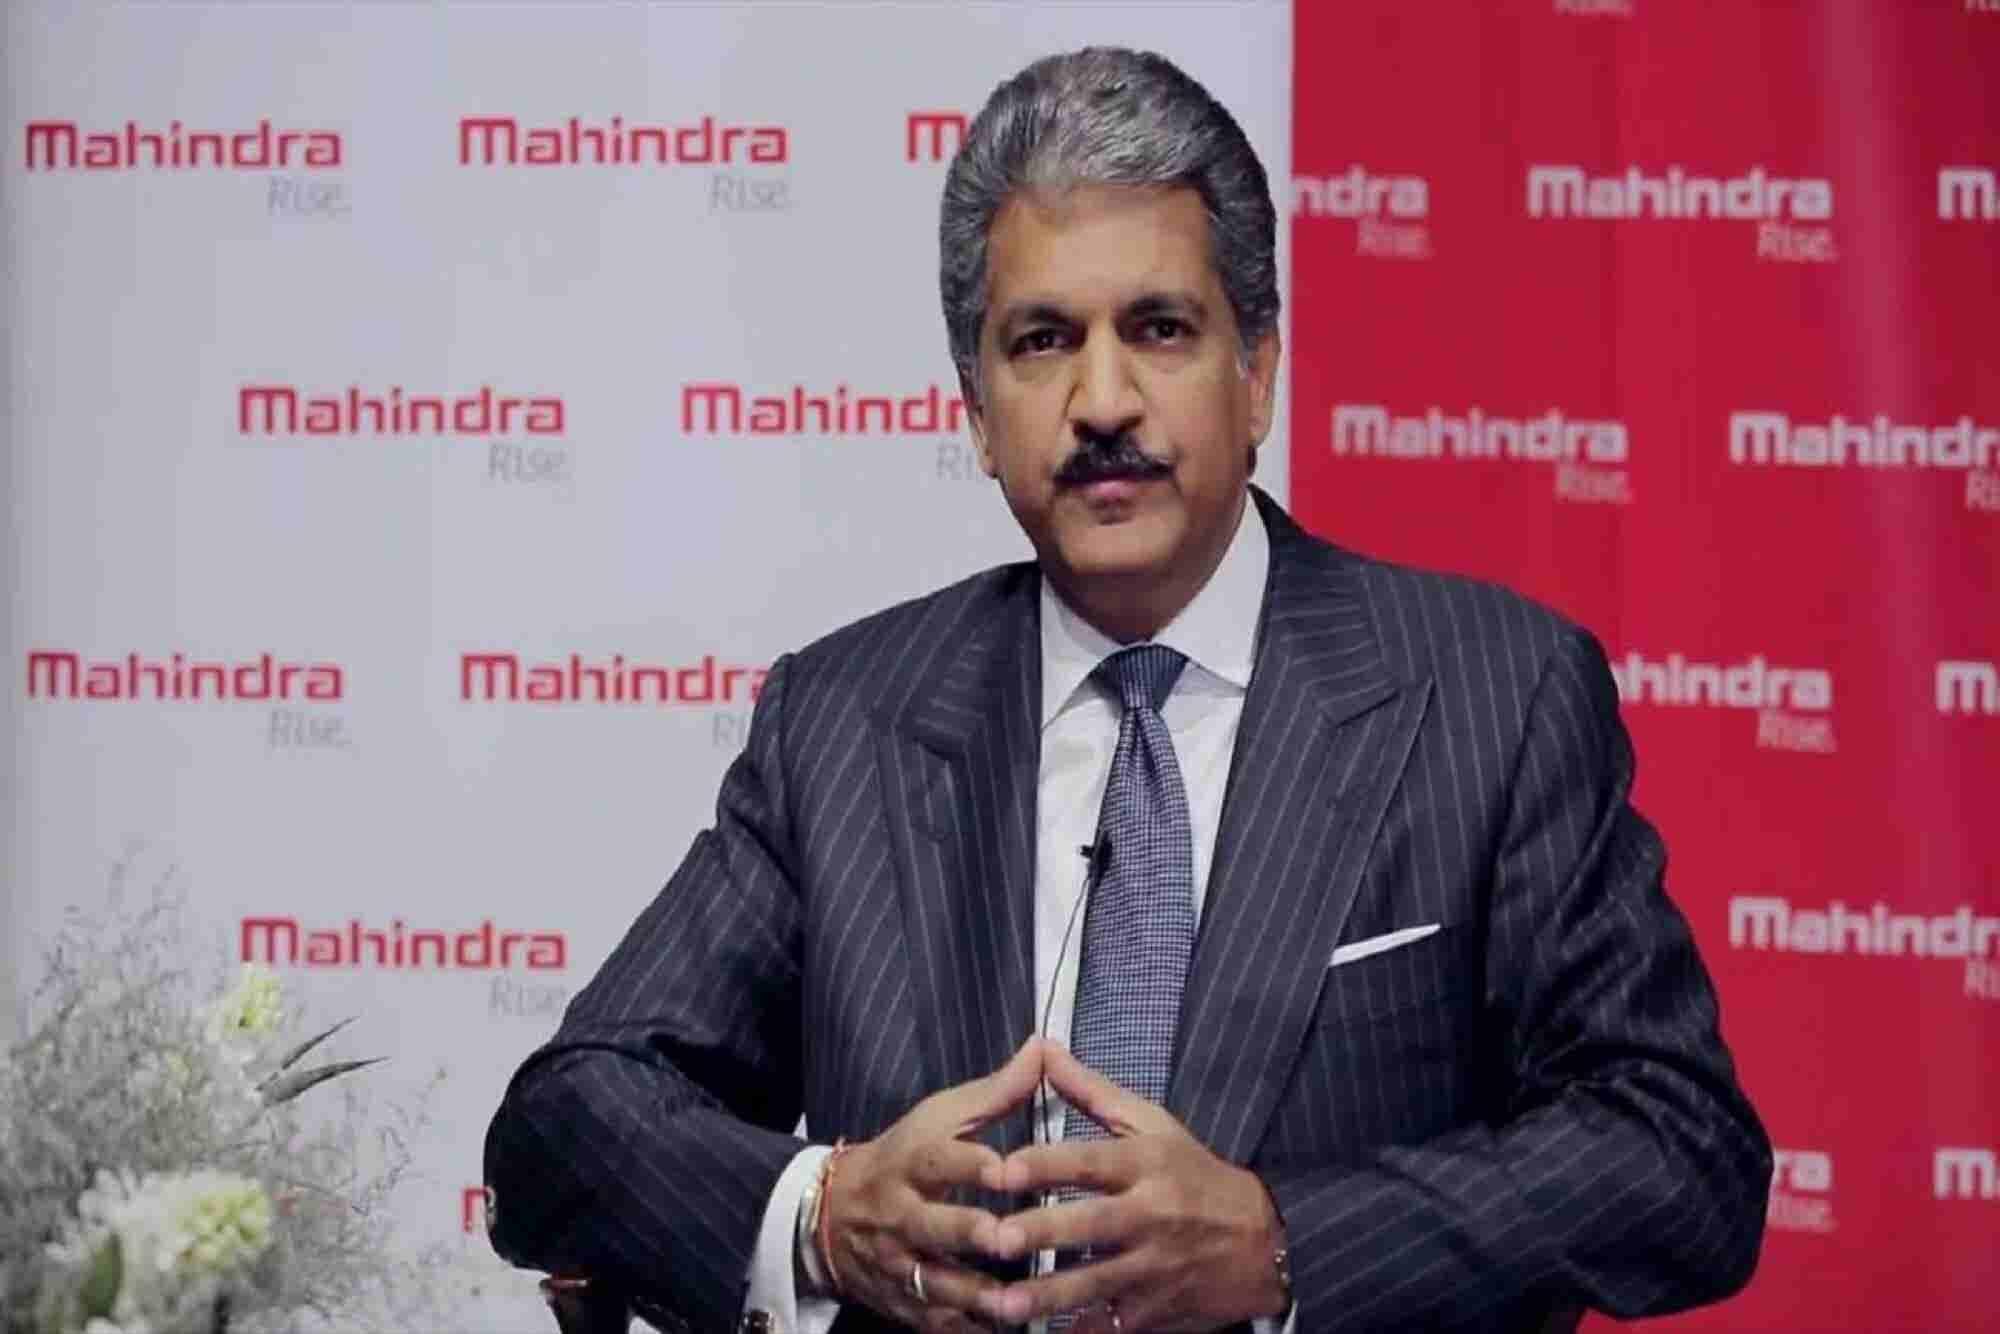 Anand Mahindra Asks Twitterati to Help Name His Next Car